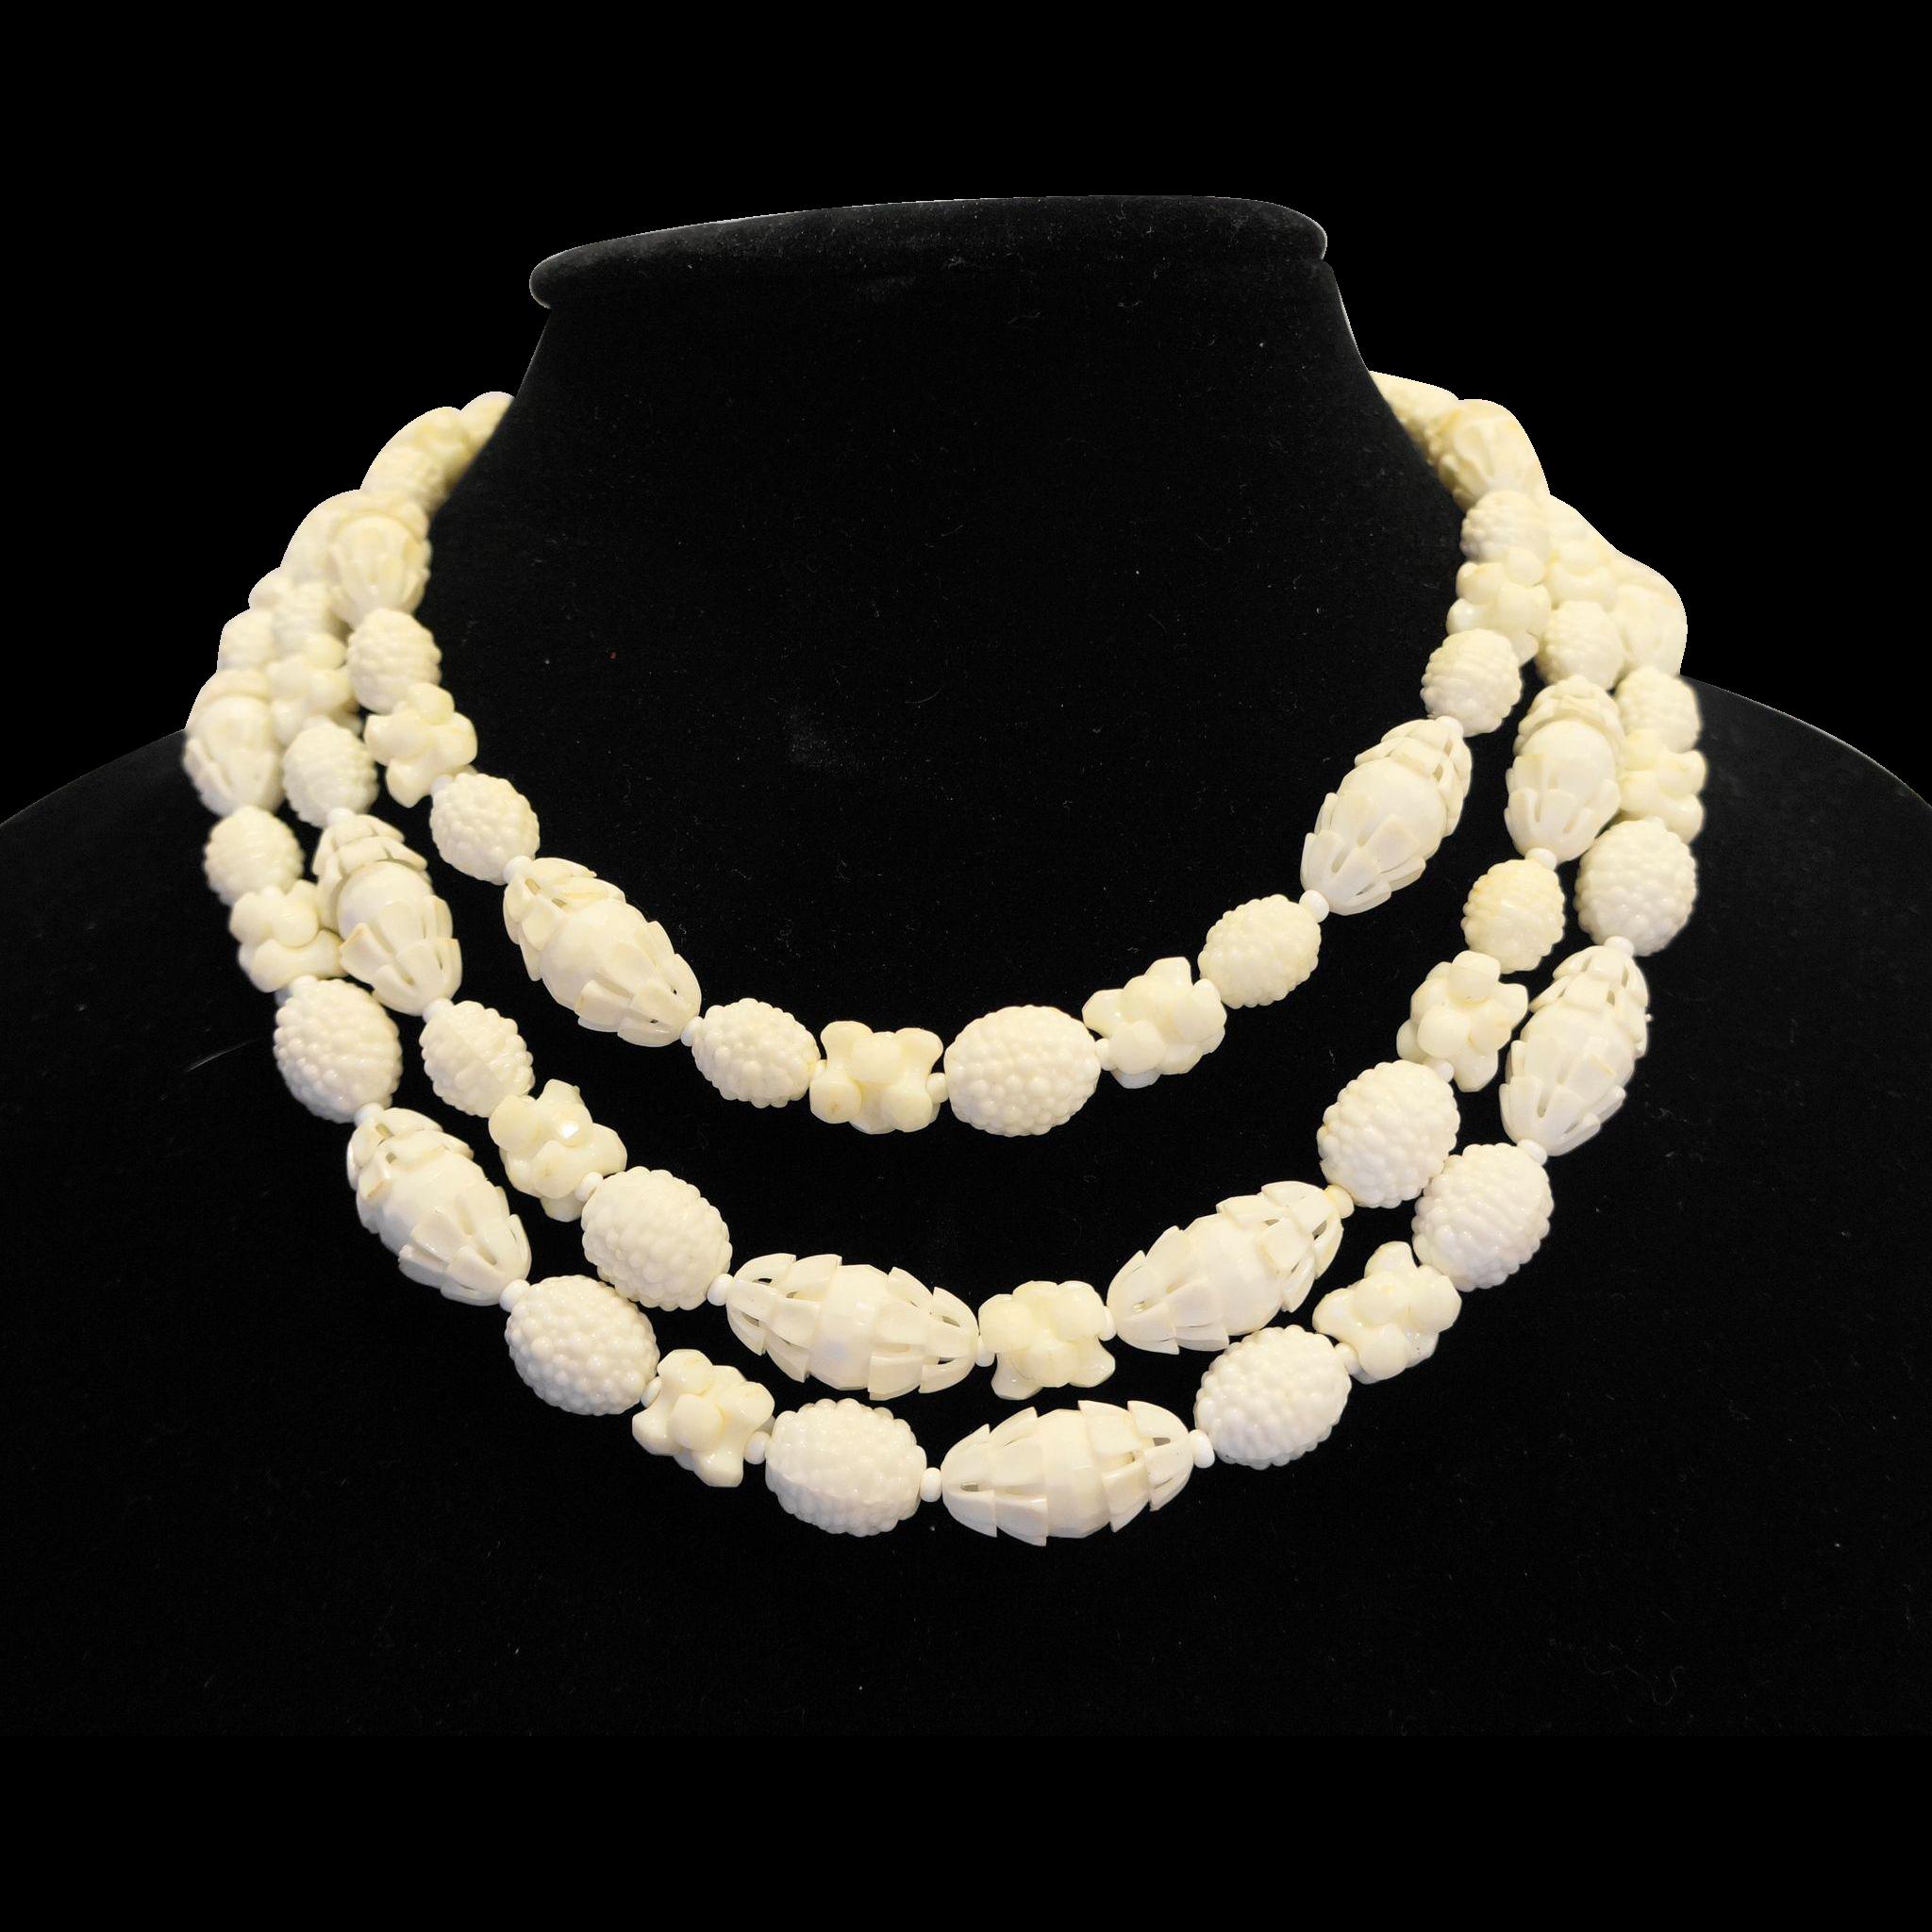 Western Germany Elaborate White Plastic Beads Triple Strand Necklace Fruit Salad